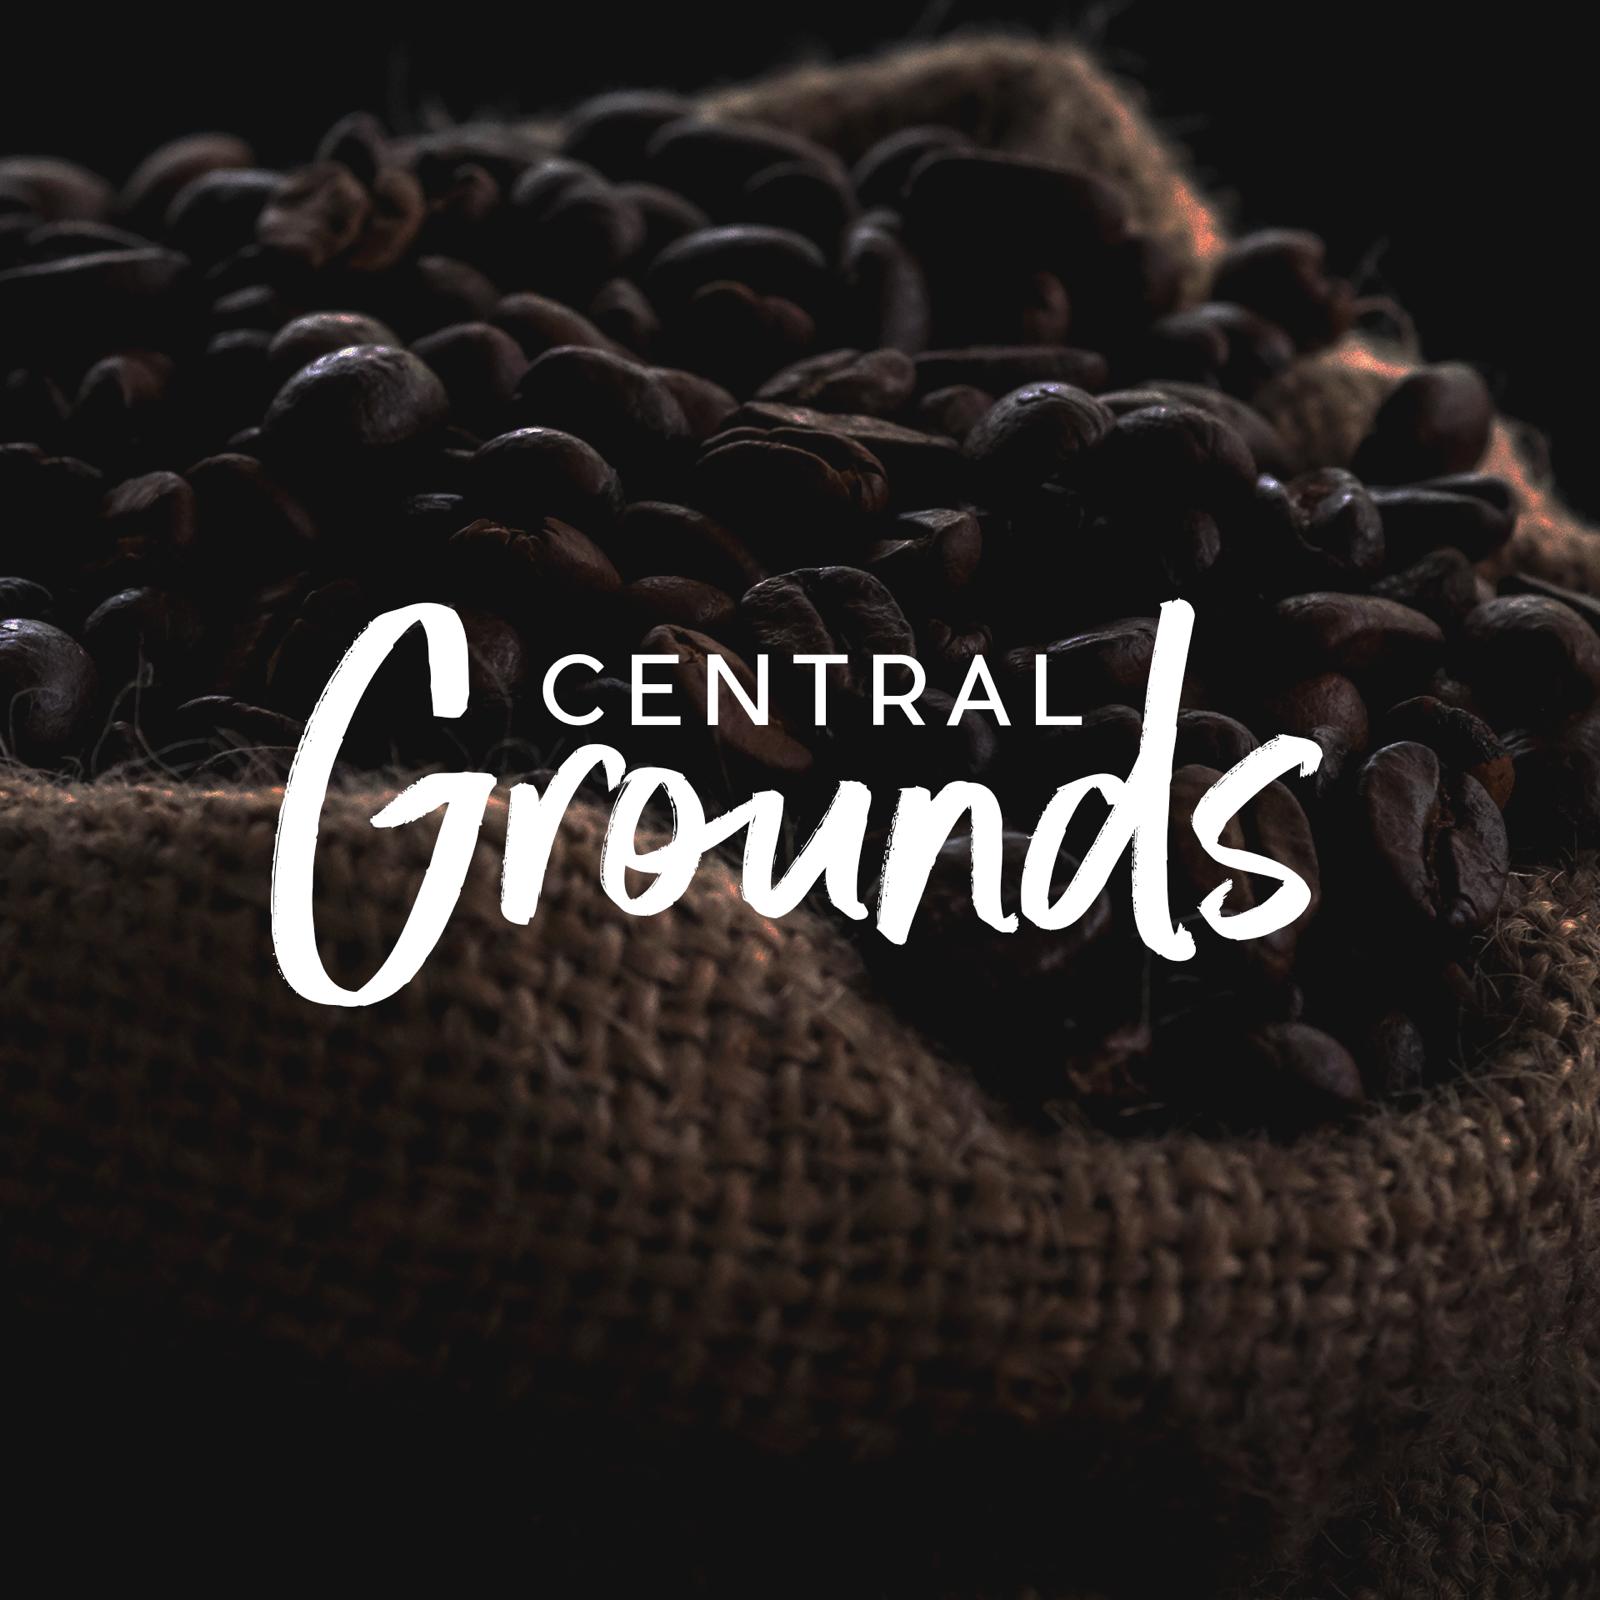 centralgroundssocial.png